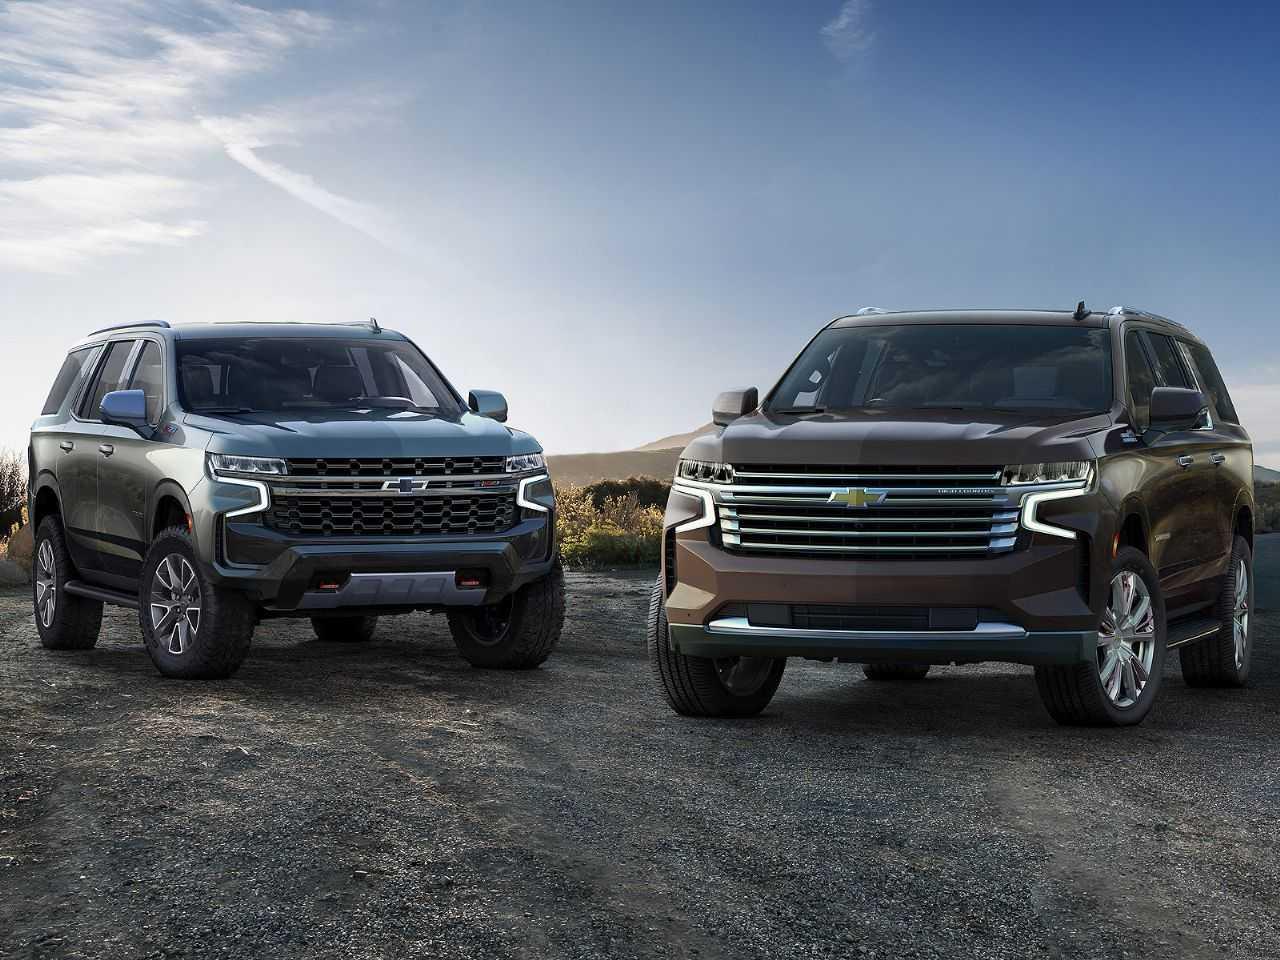 Os novos Chevrolet Tahoe Z71 2021 (esq.) e o Chevrolet Suburban High Country 2021